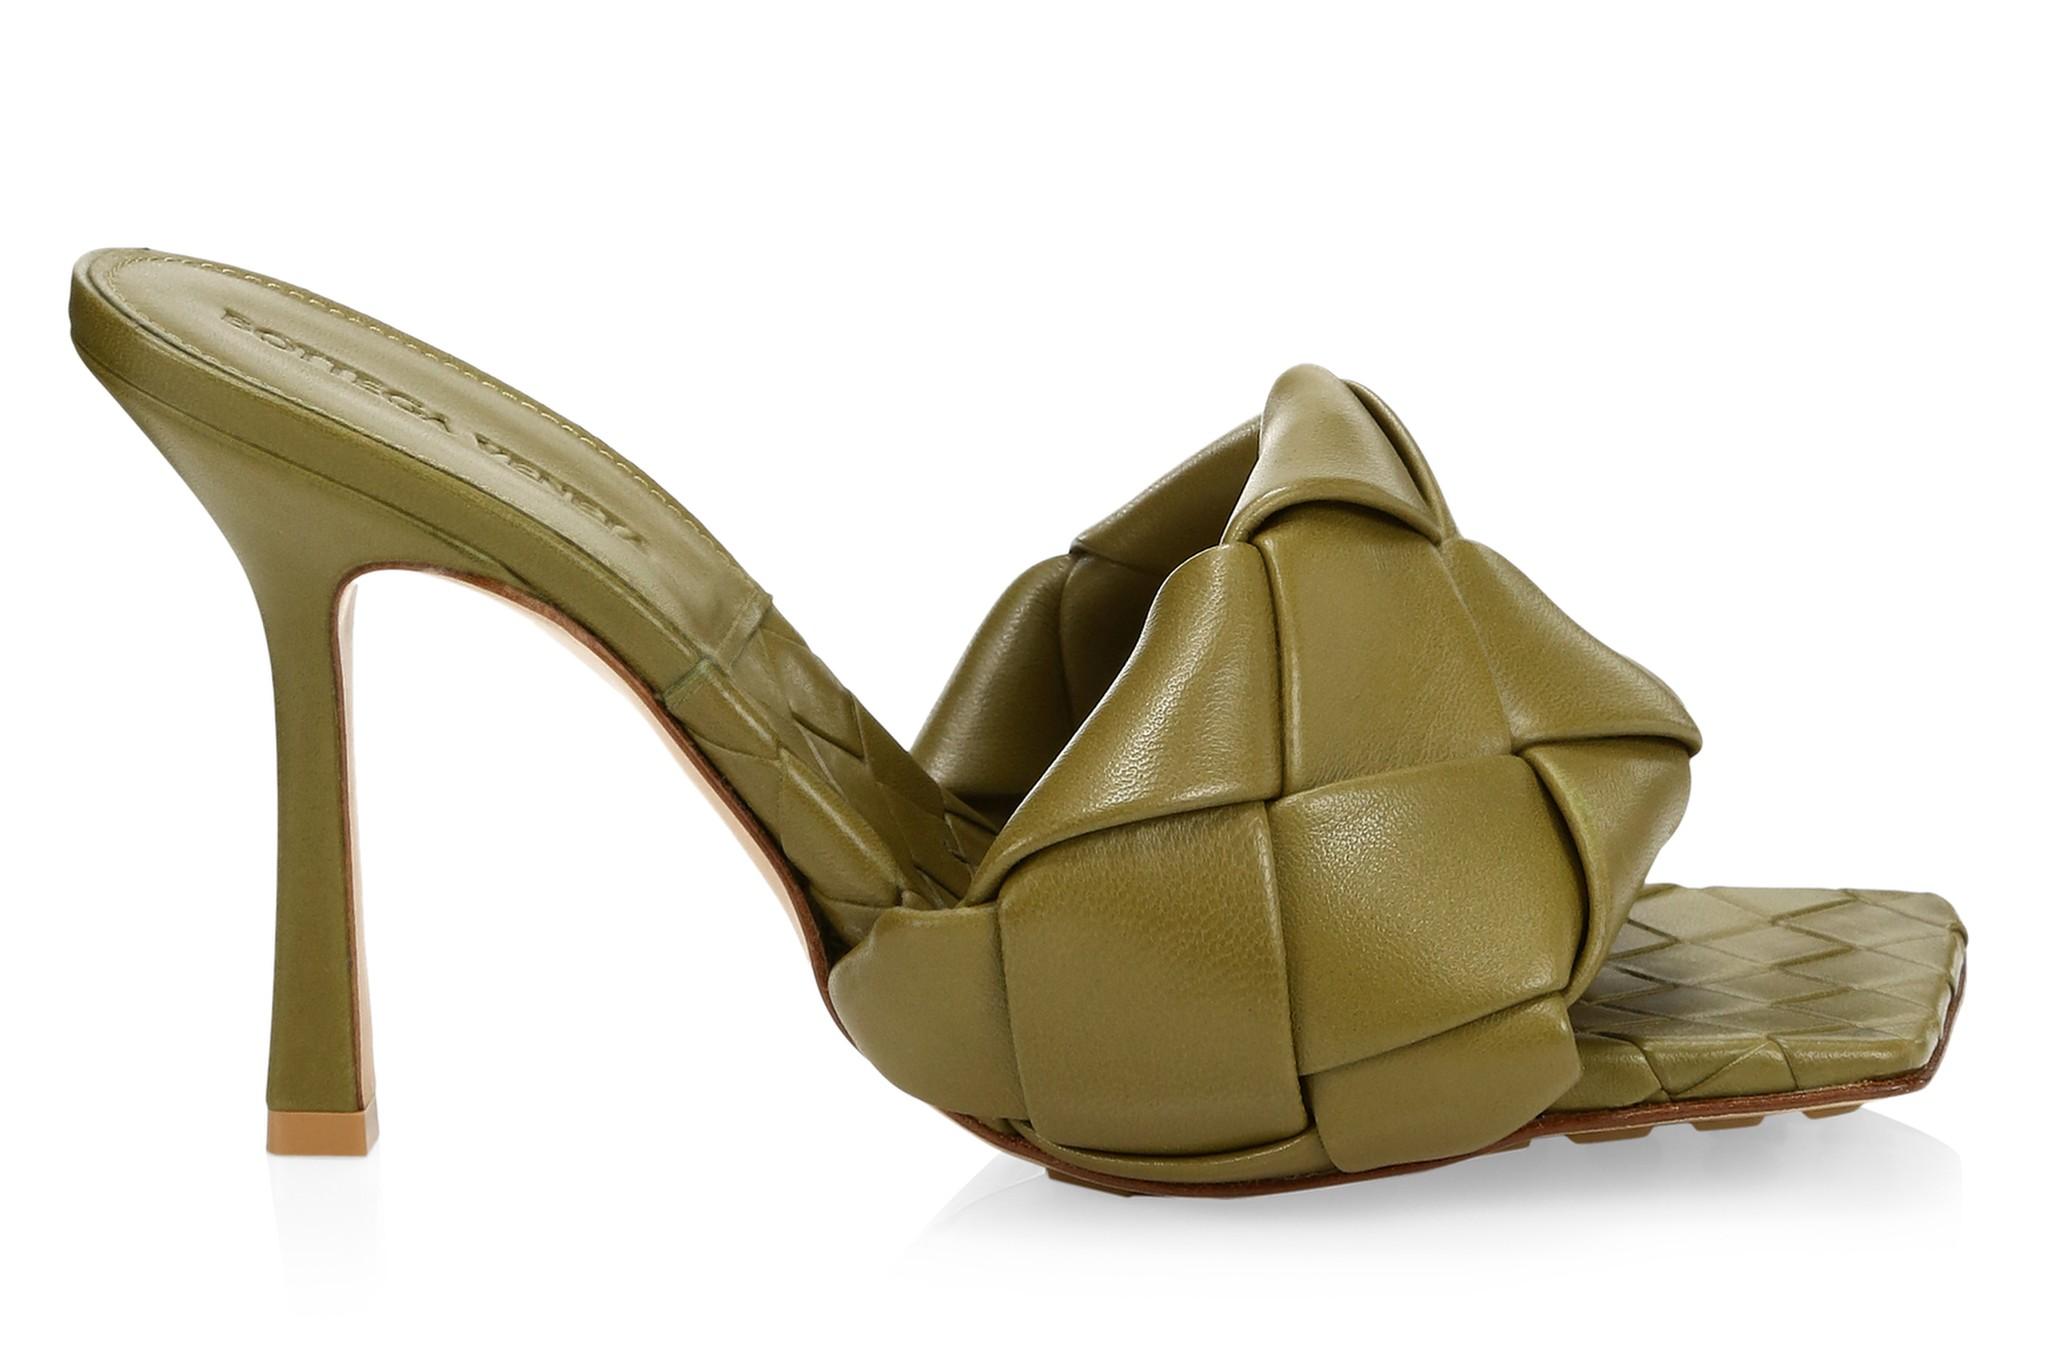 Bottega Veneta Lido leather mules.